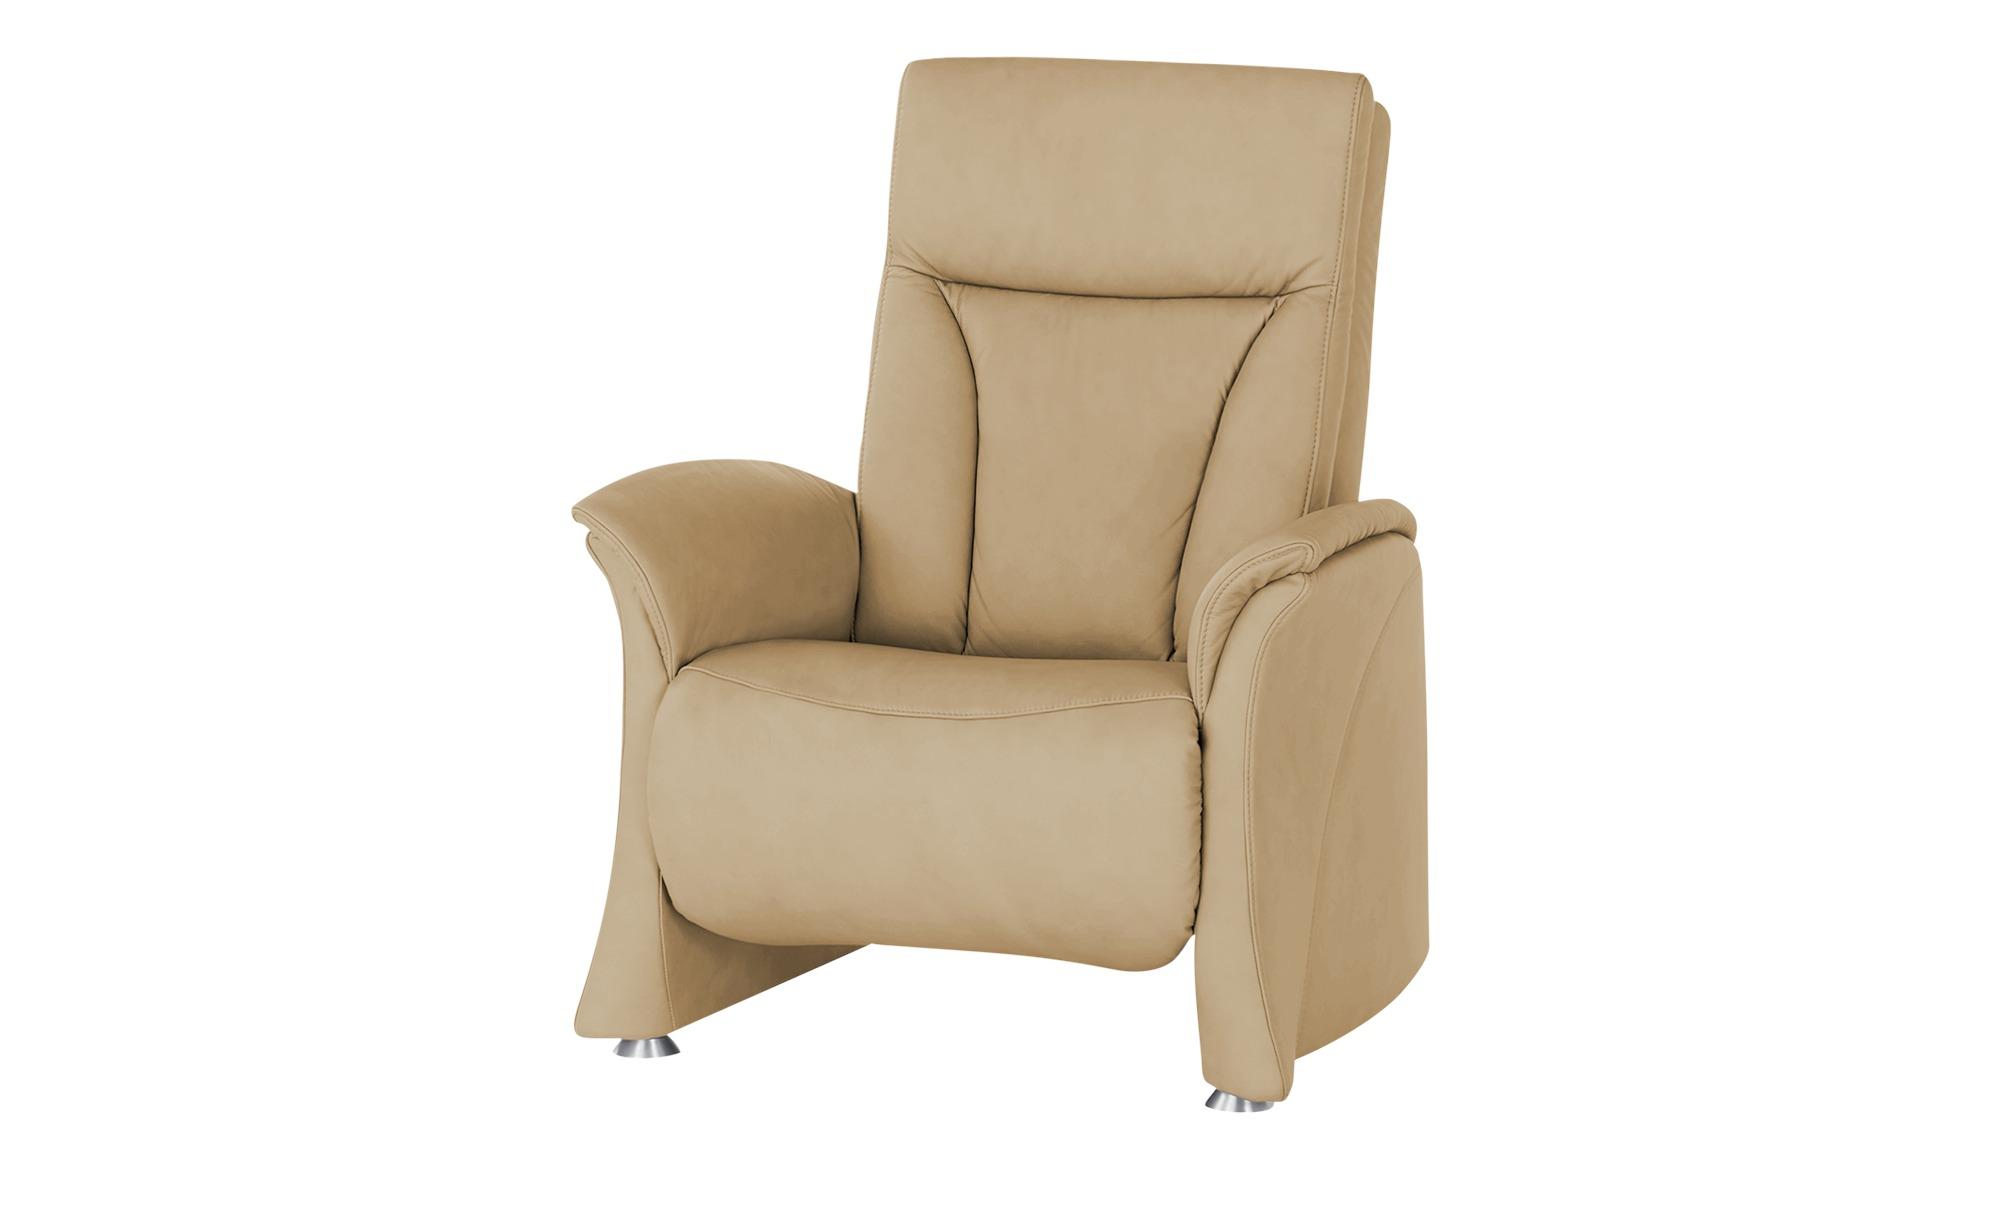 himolla Sessel  4010 ¦ beige ¦ Maße (cm): B: 75 H: 108 T: 88 Polstermöbel > Sessel > Ledersessel - Höffner